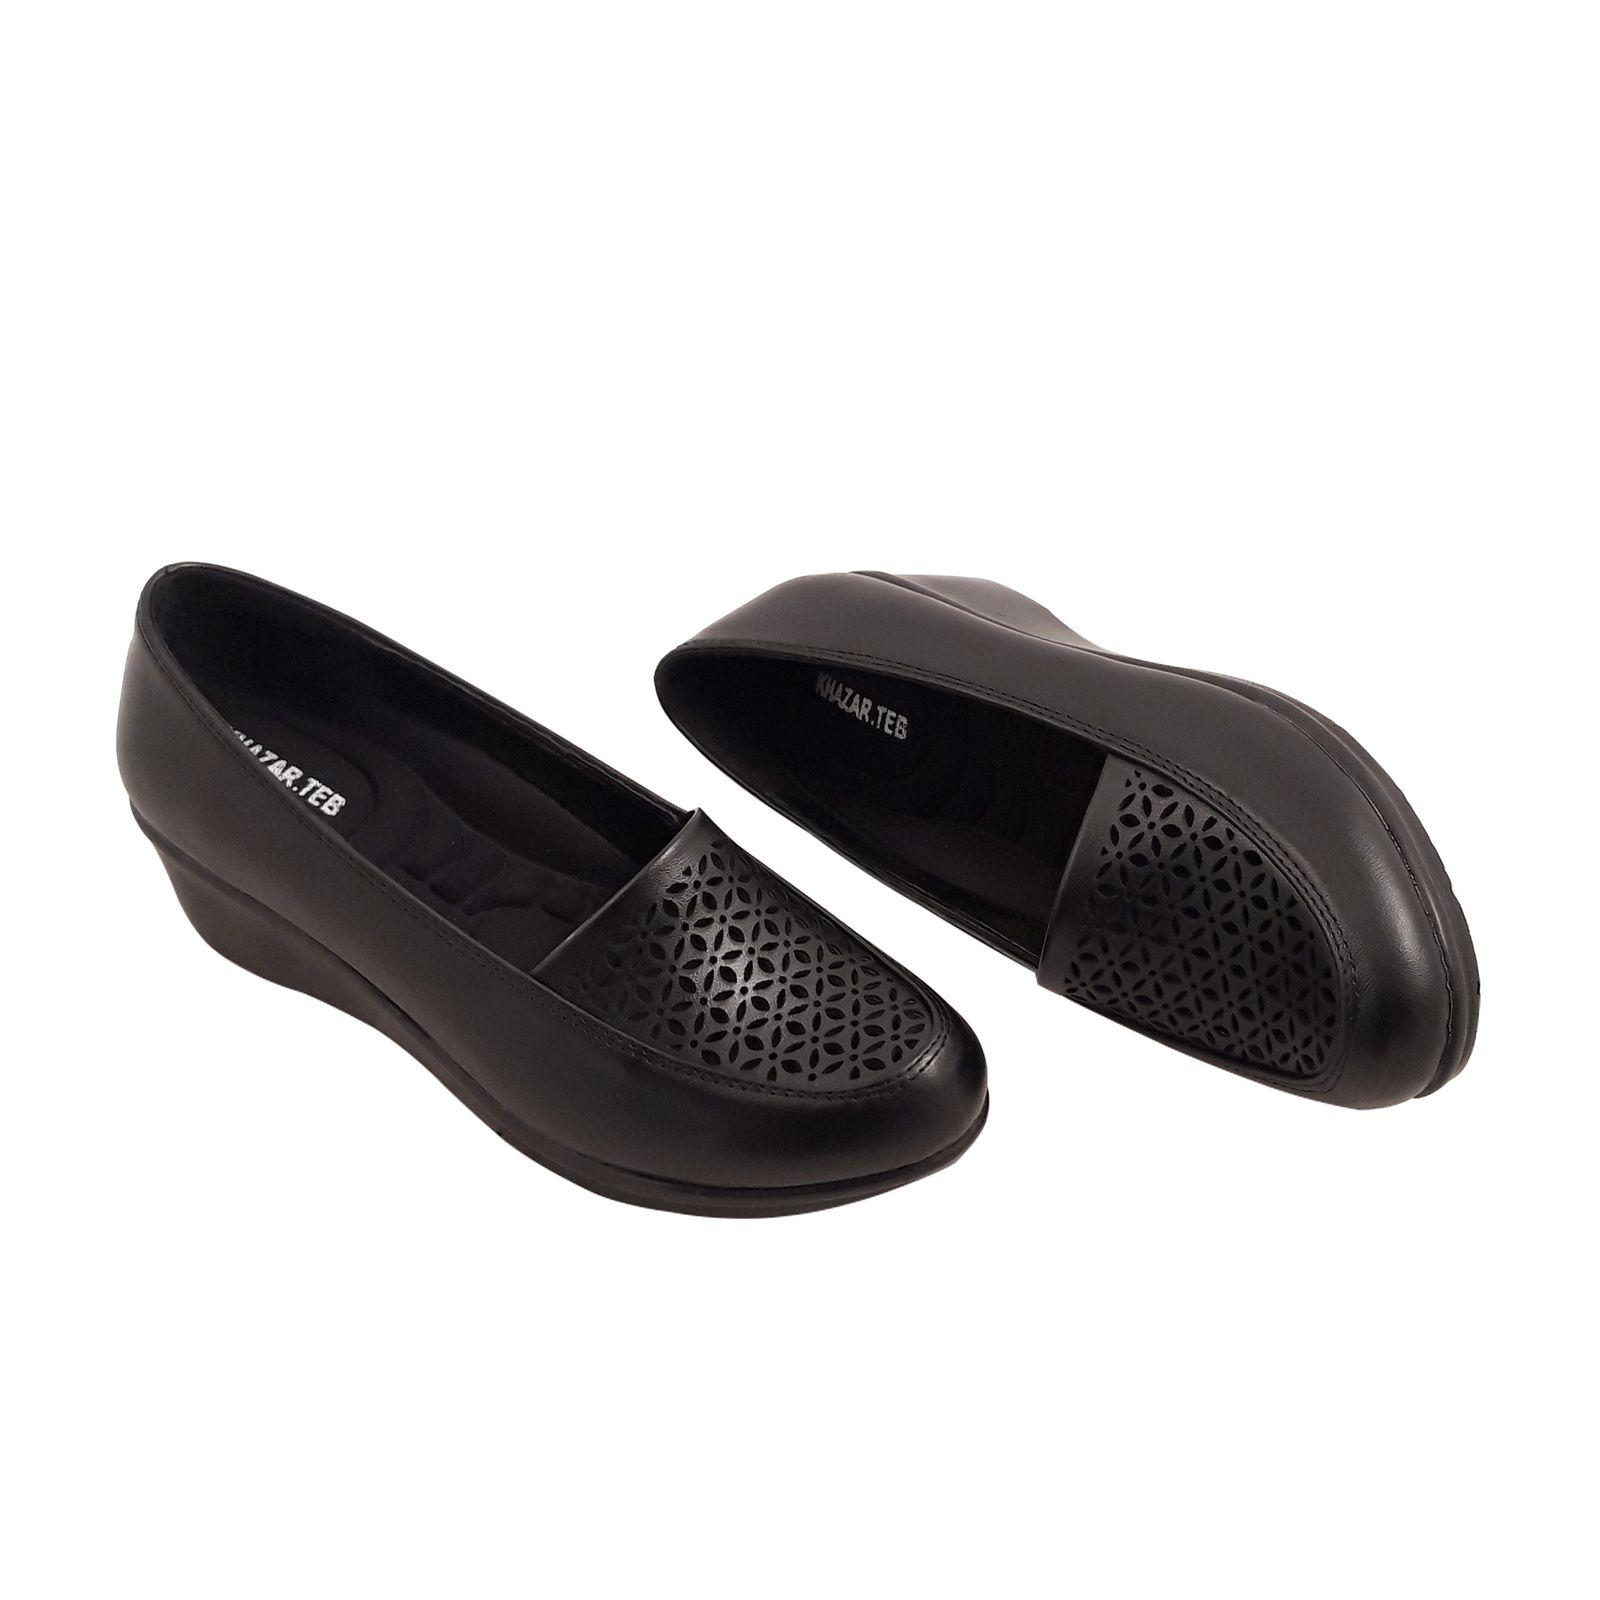 کفش روزمره زنانه خزر طب کد 409 main 1 1